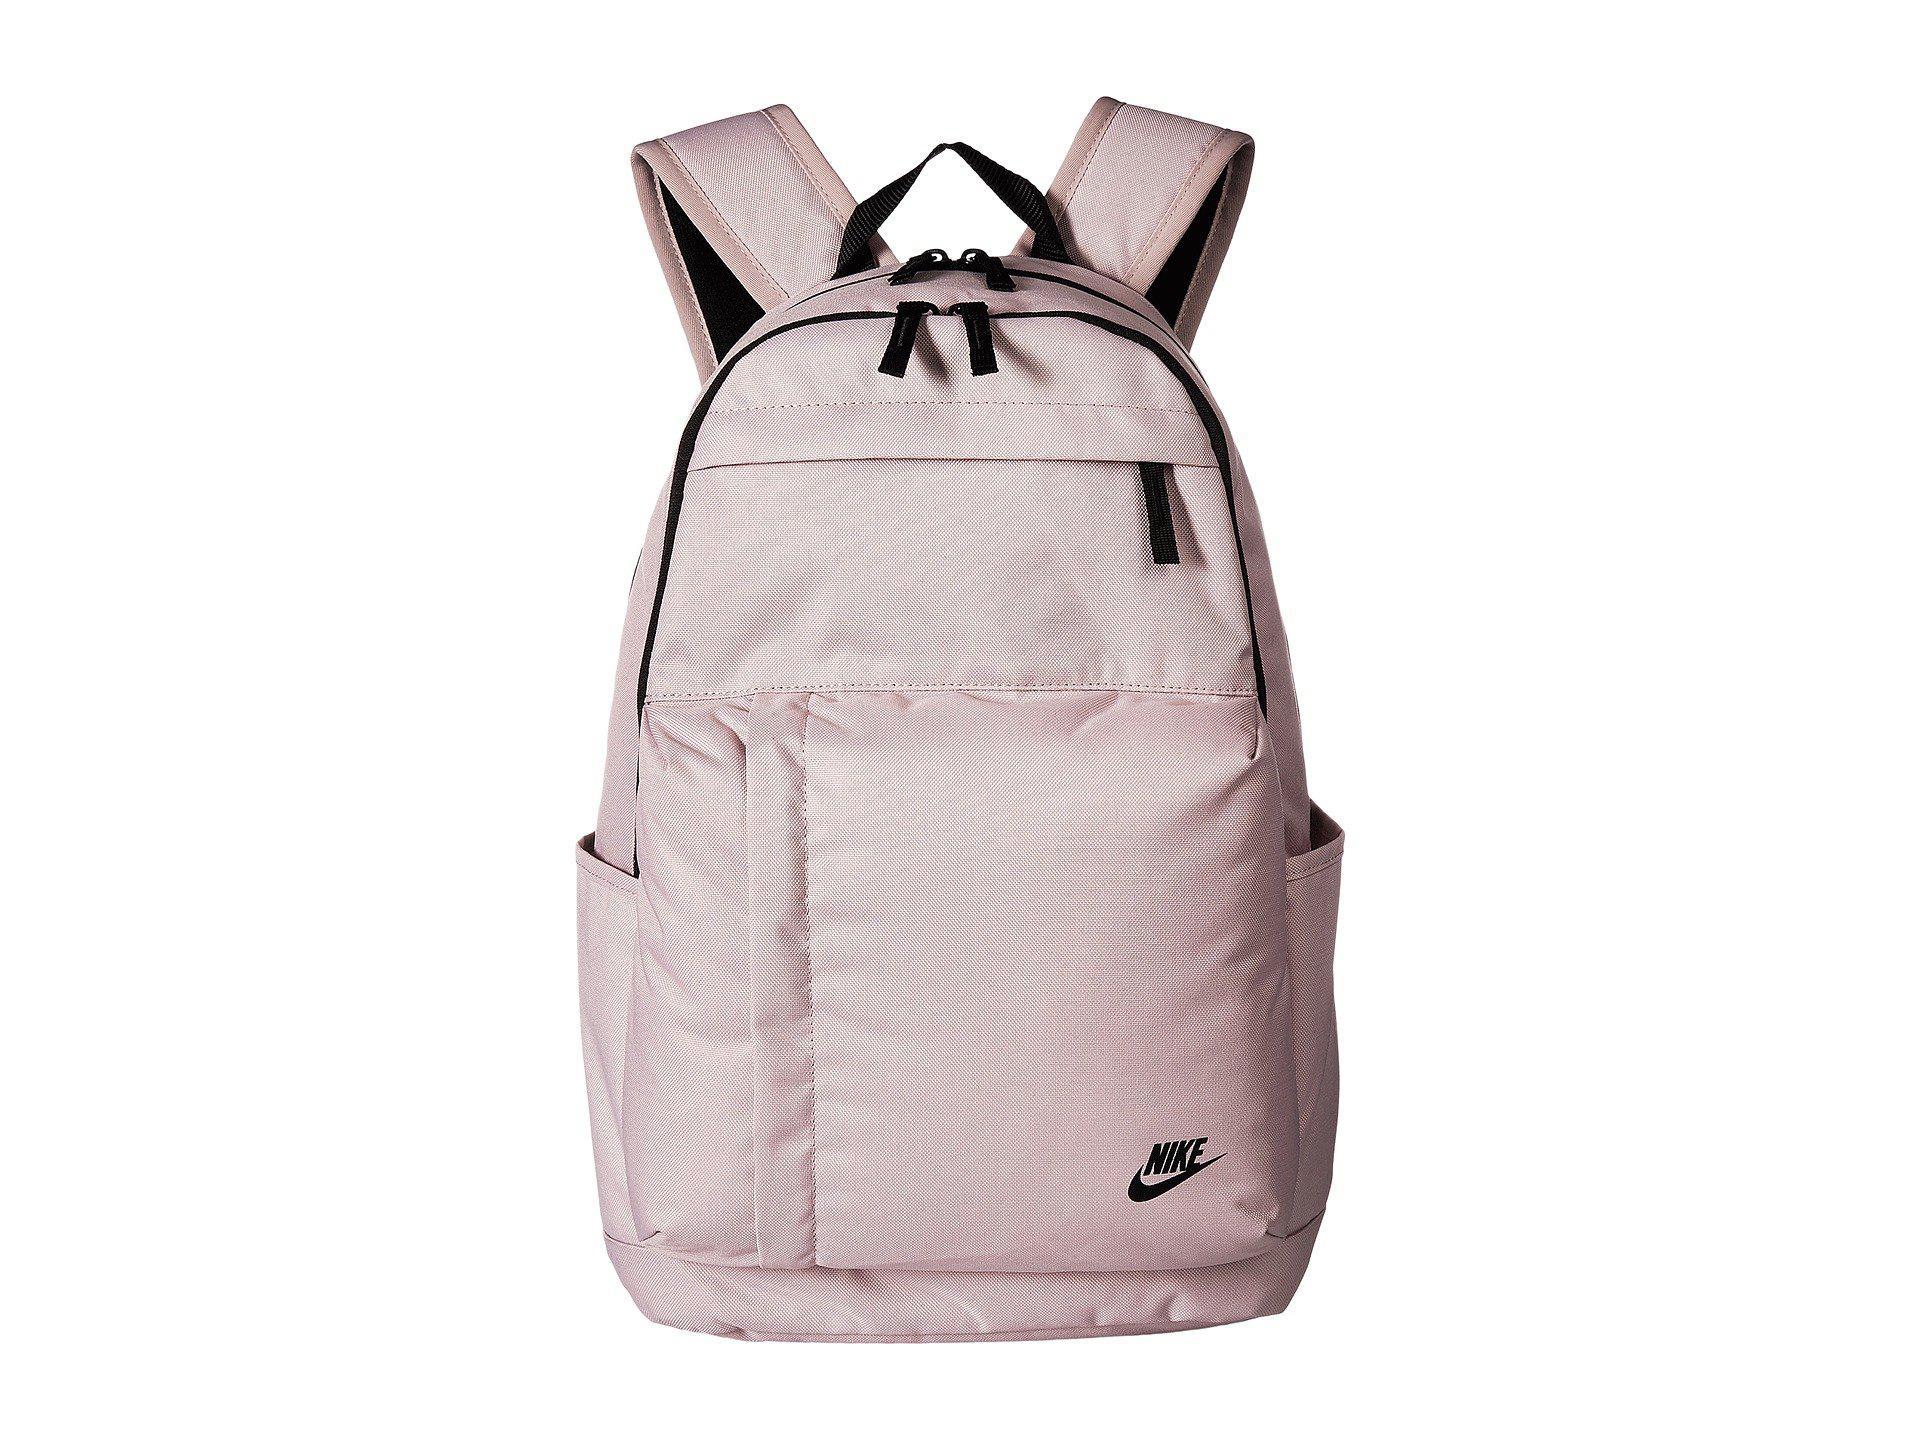 8ff210a3358 Nike Elemental Backpack - Lbr in Black - Lyst